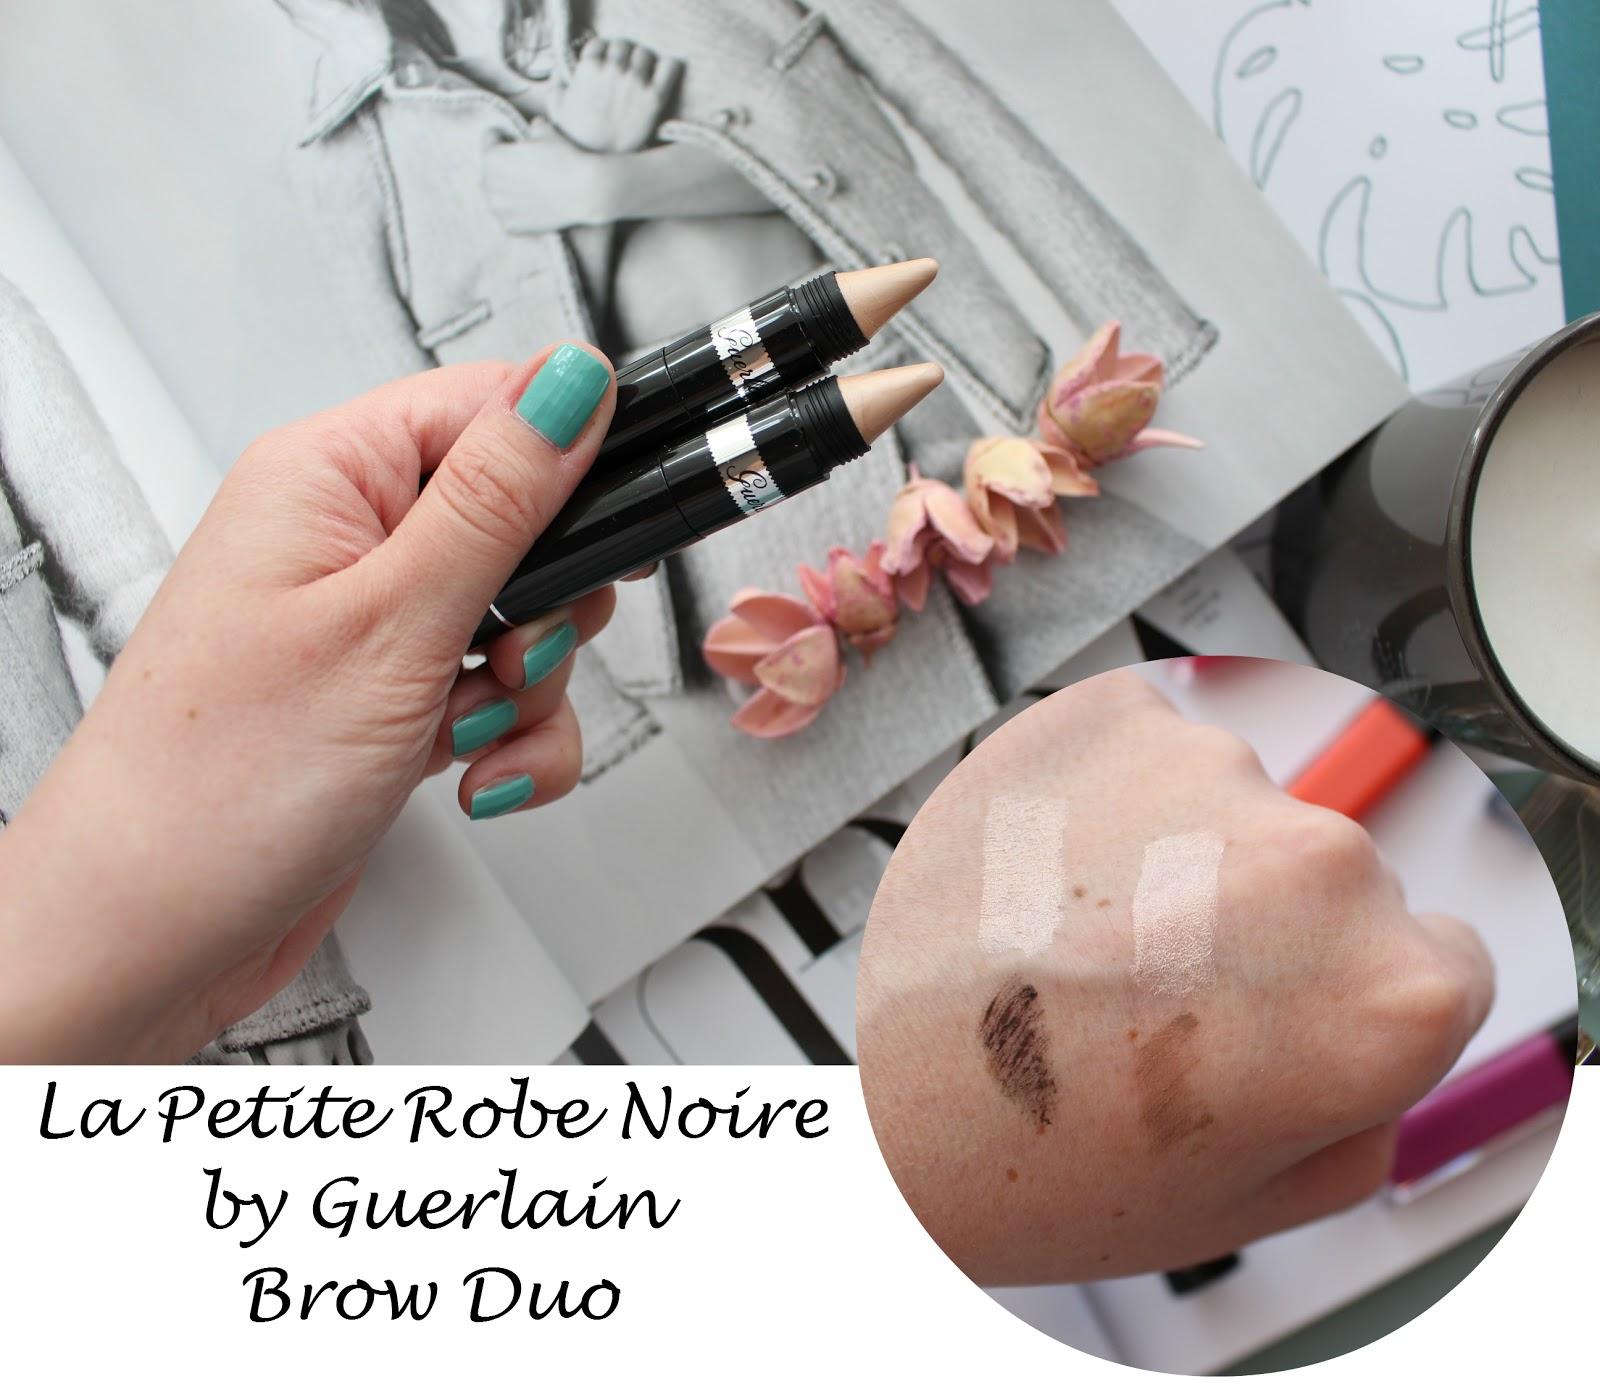 39da2df5bc5 Metamorfoza brwi z Guerlain La Petite Robe Noire Brow Duo